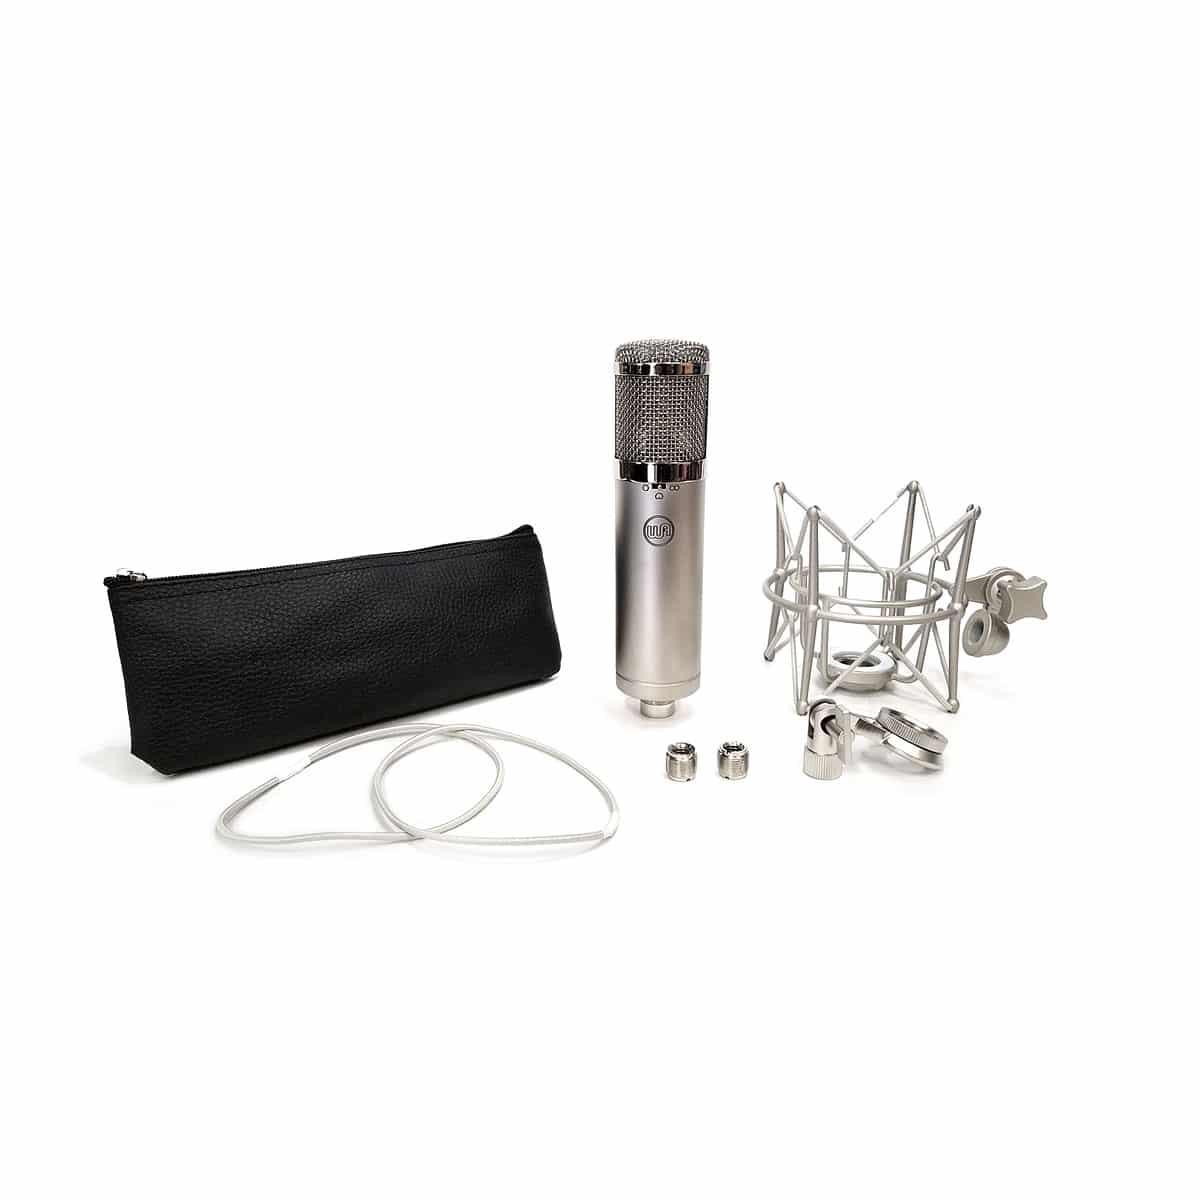 Warm Audio WA 47JR 05 Microfoni, Microfoni a Condensatore, Pro Audio